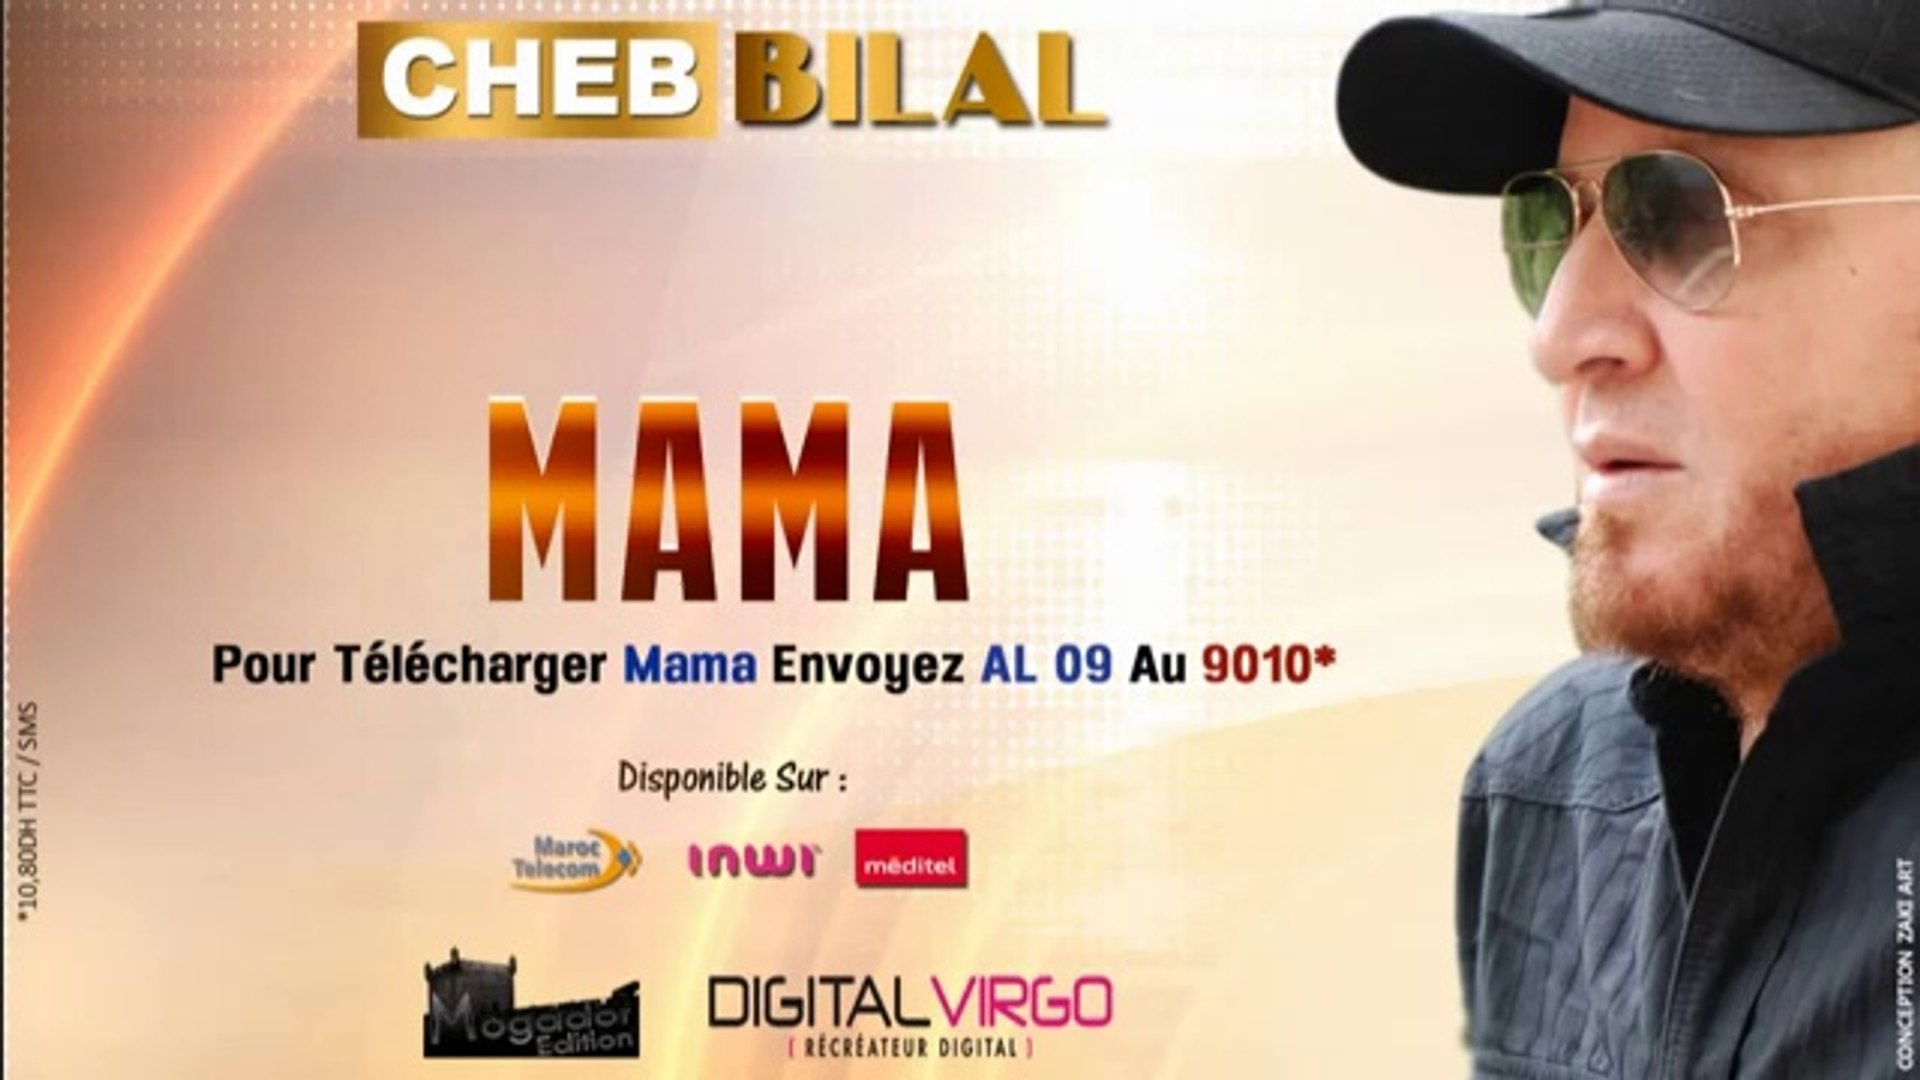 BILAL 2011 TÉLÉCHARGER SENORITA CHEB ALBUM